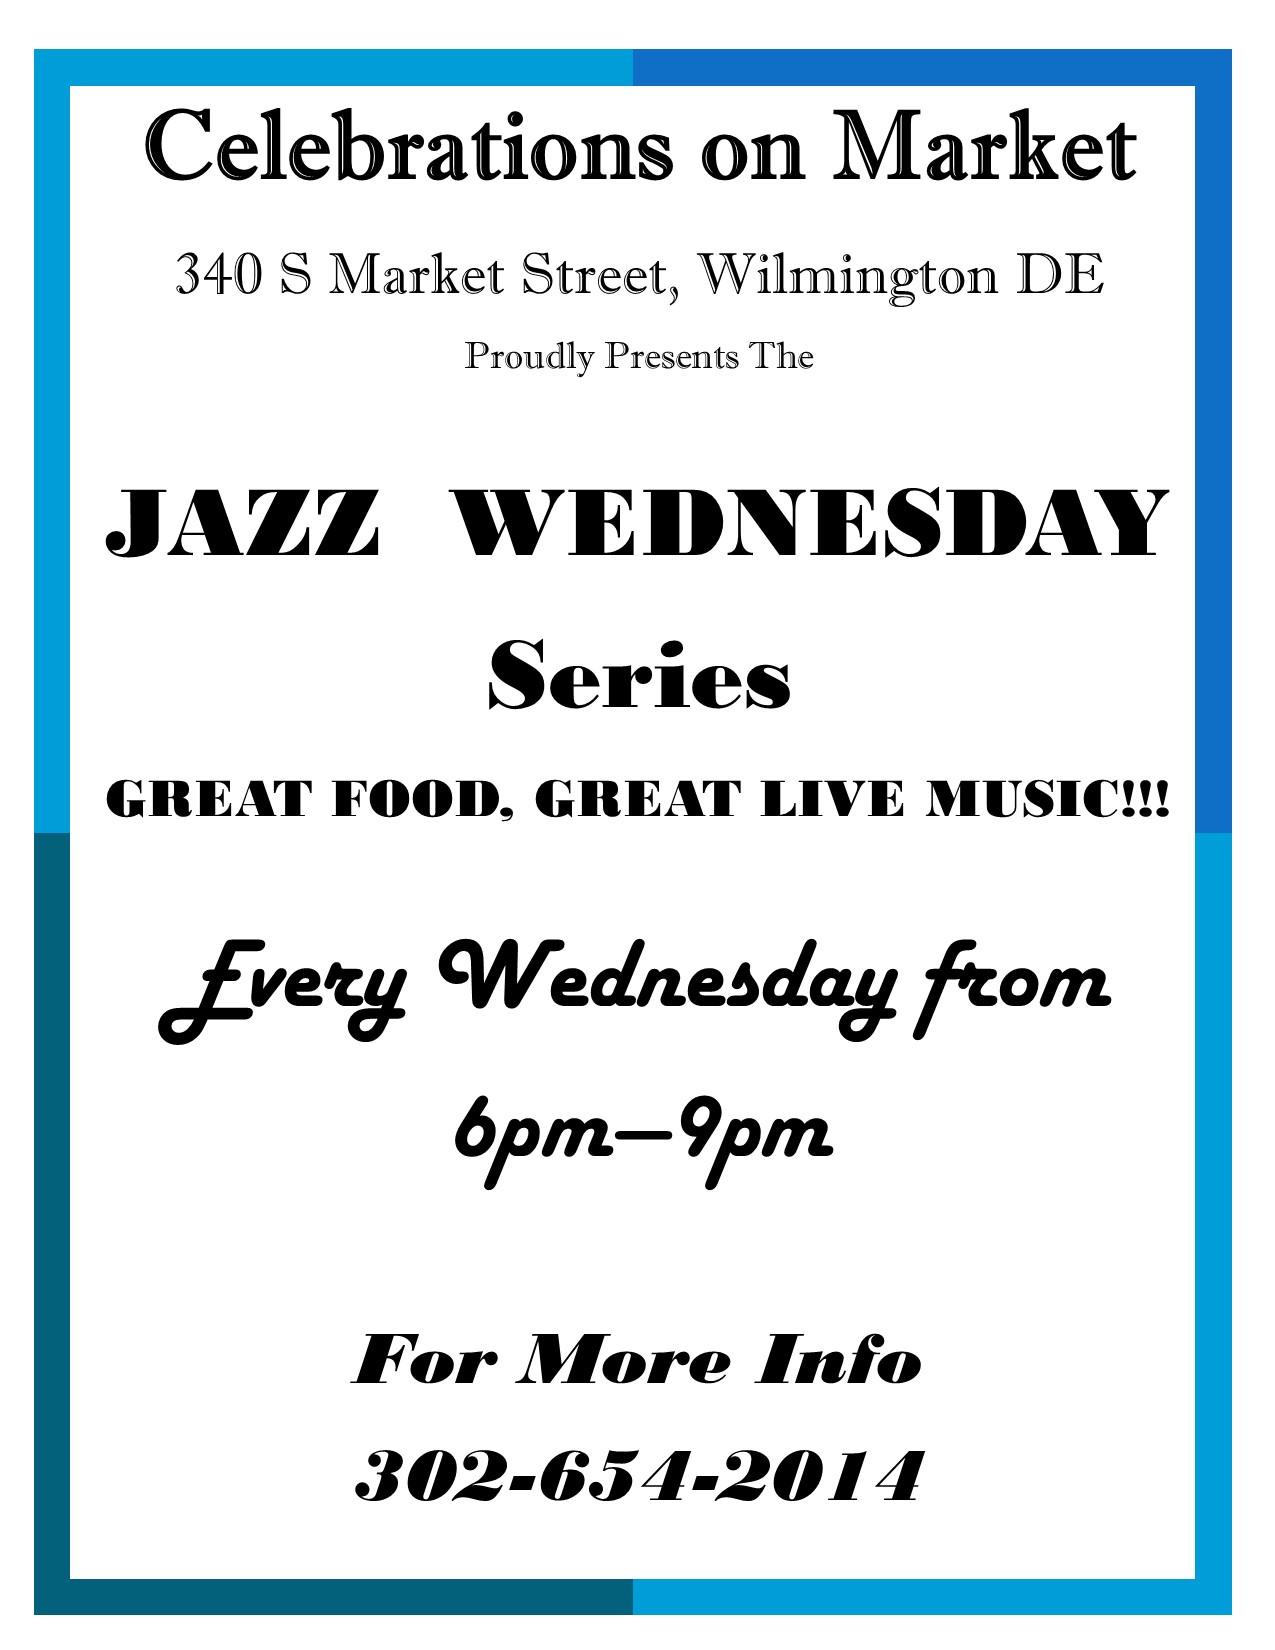 Jazz Wednesday Series